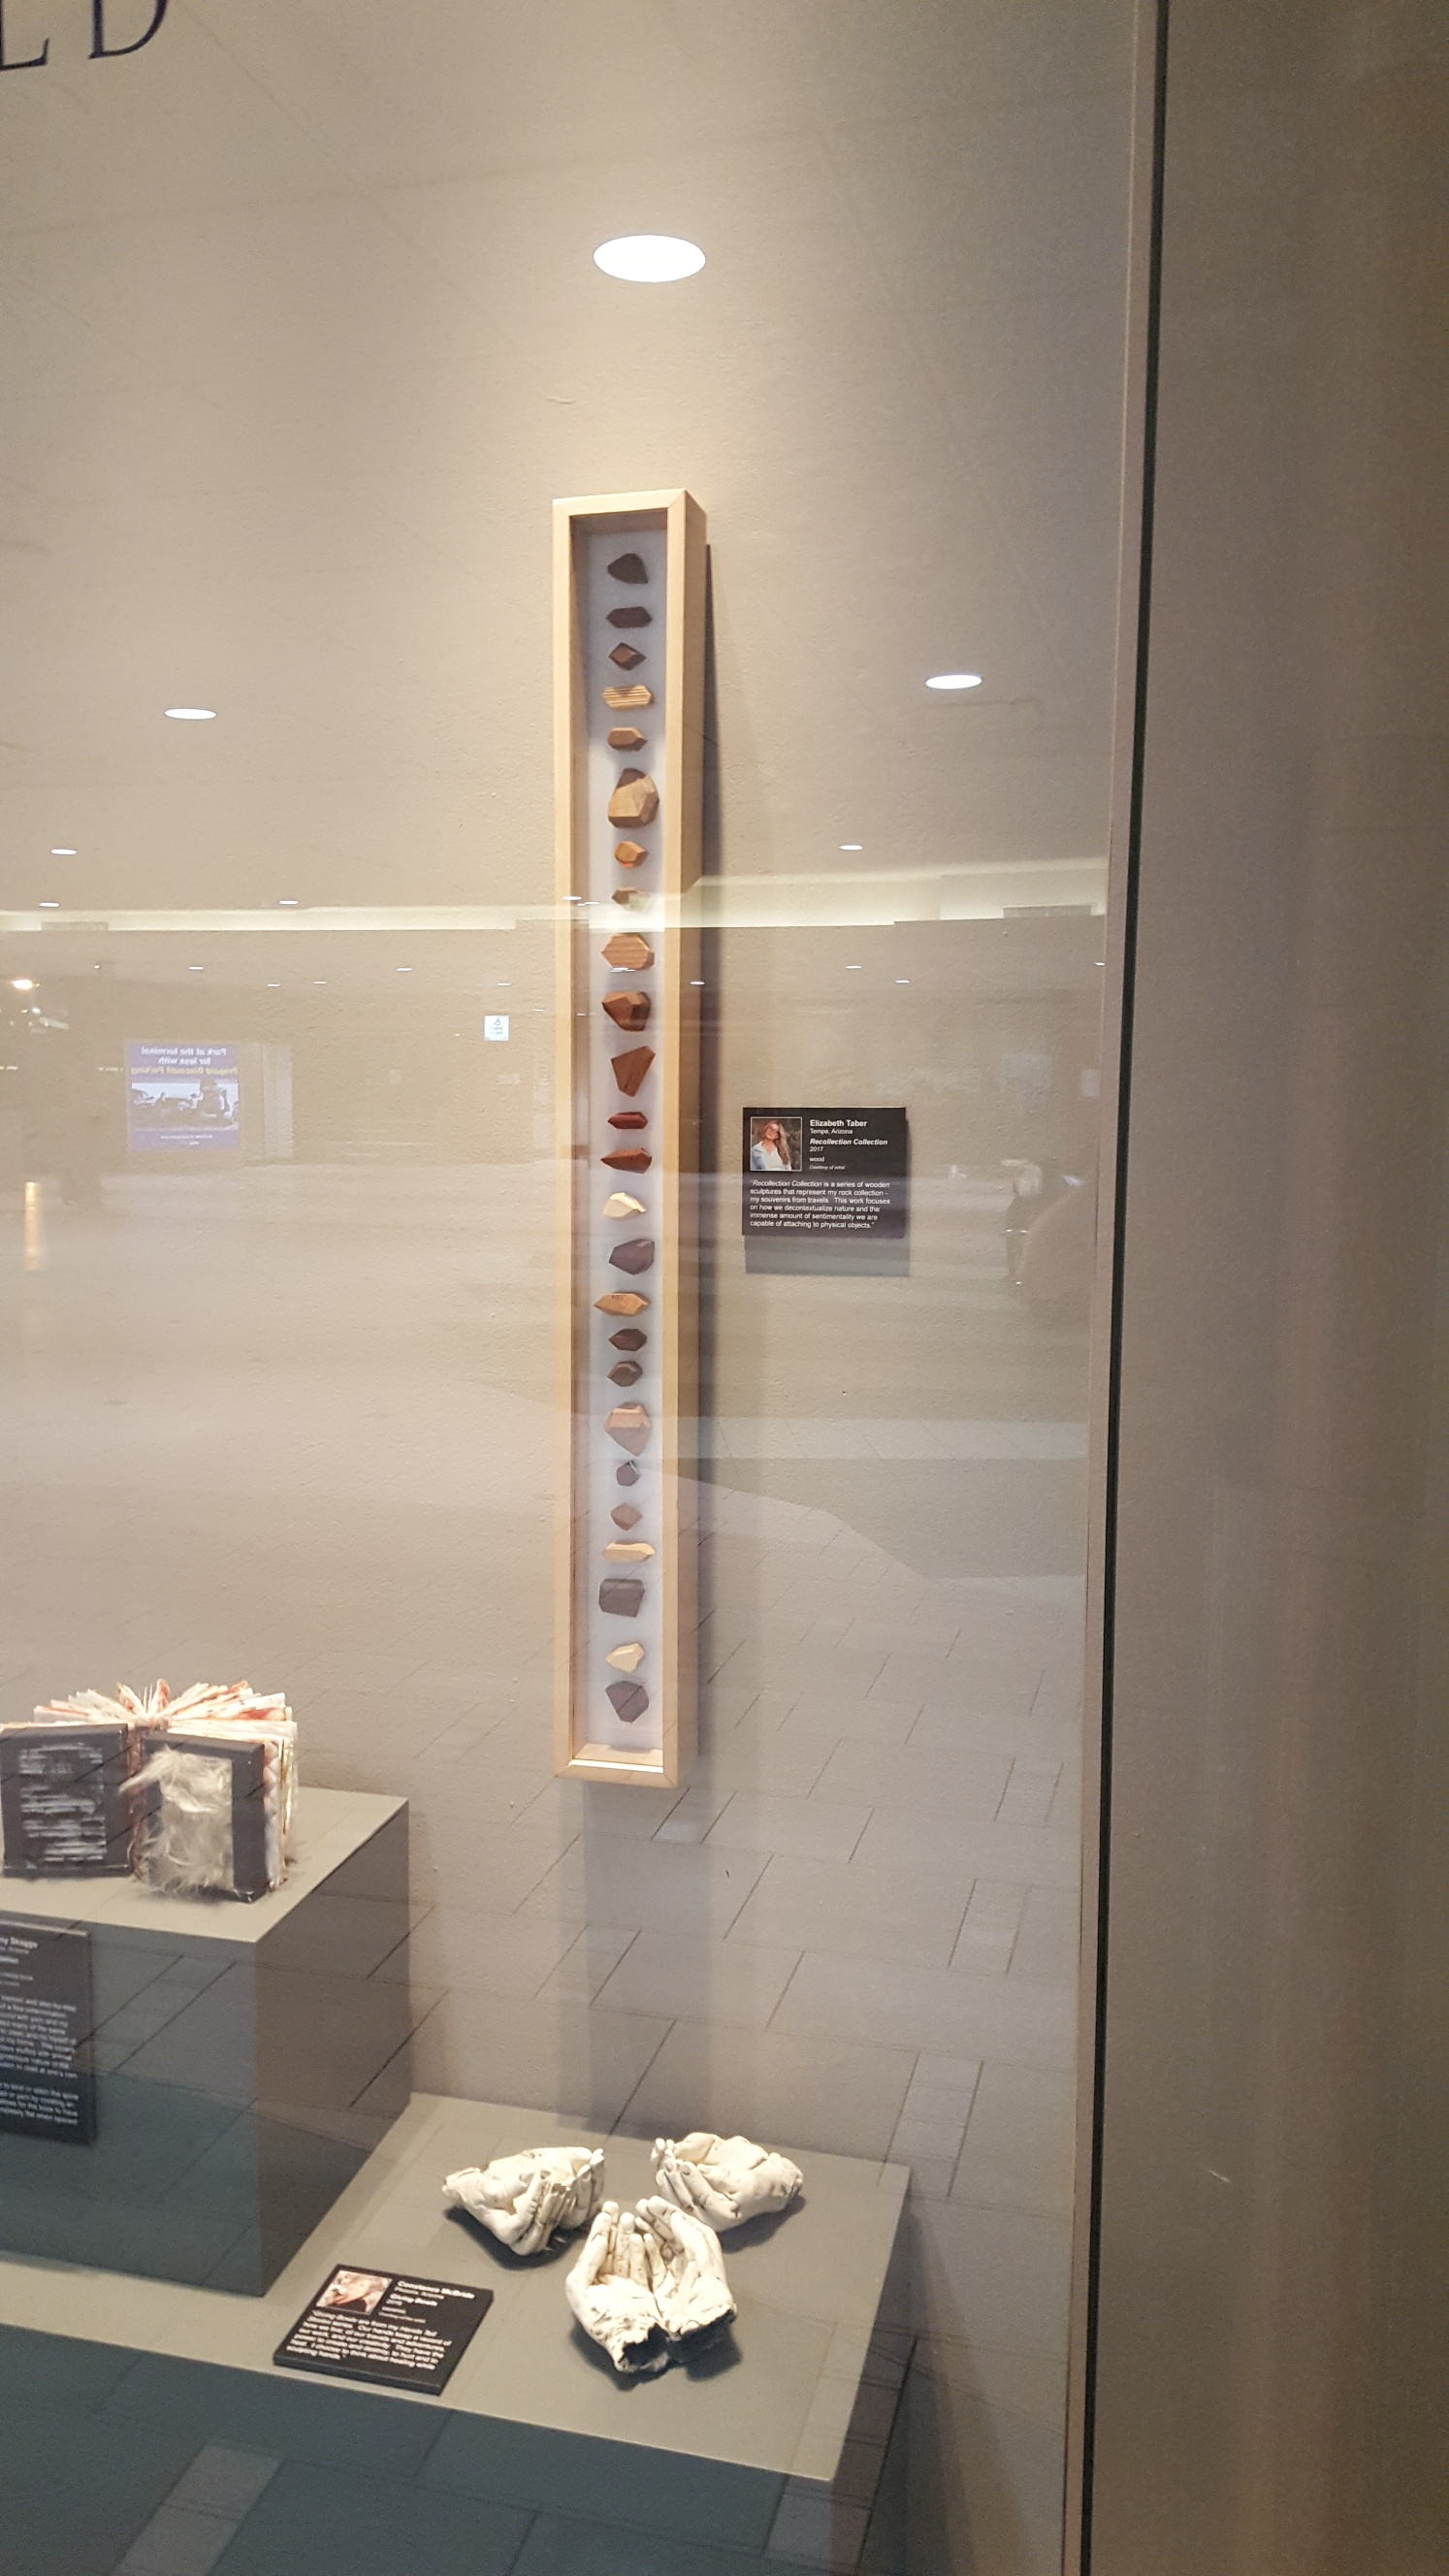 On display in the Phoenix Sky Harbor Airport in Terminal 4, in the Phoenix Sky Harbor Airport Museum.